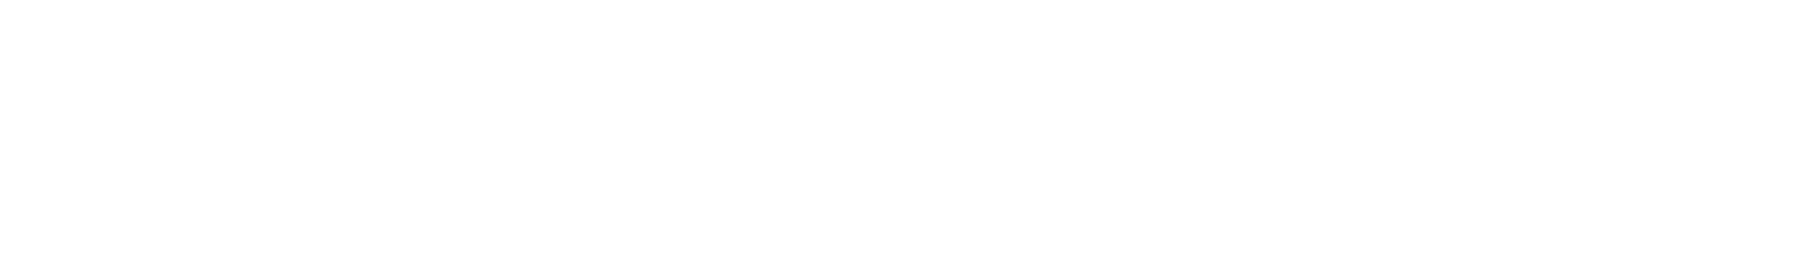 organ f